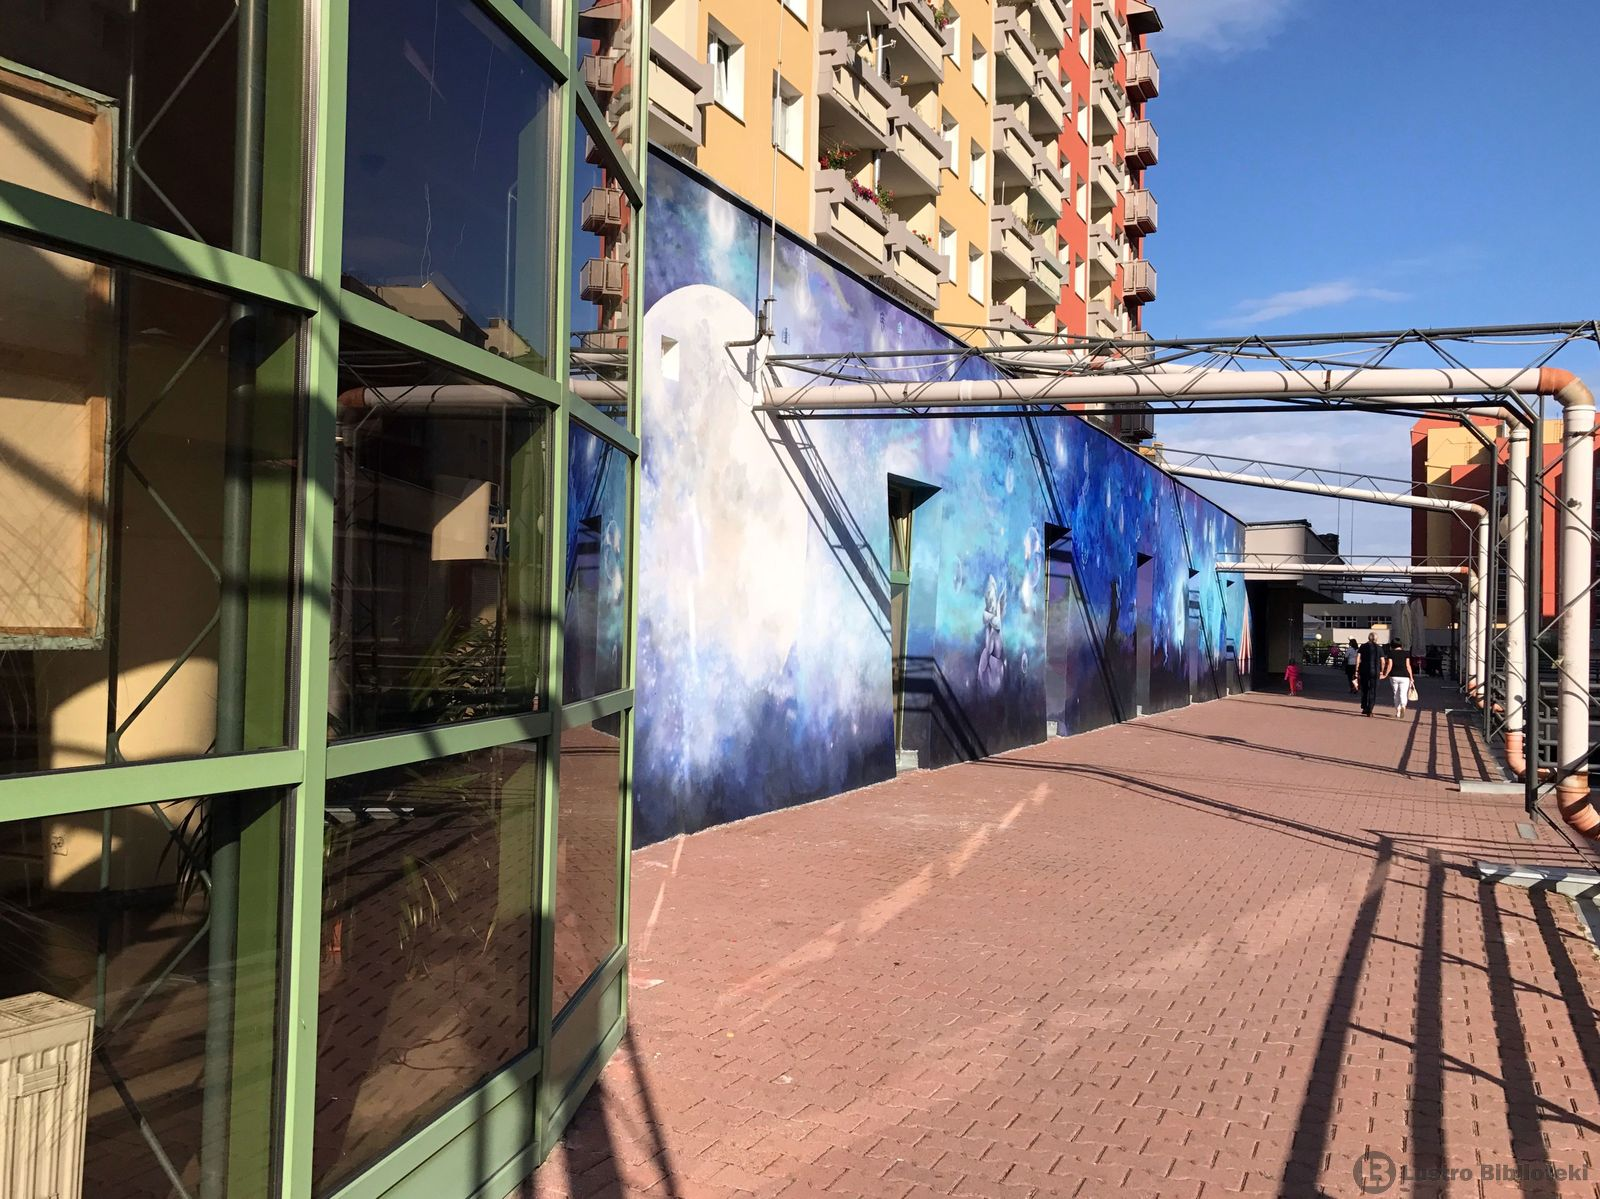 mural_MBP_Wrocław